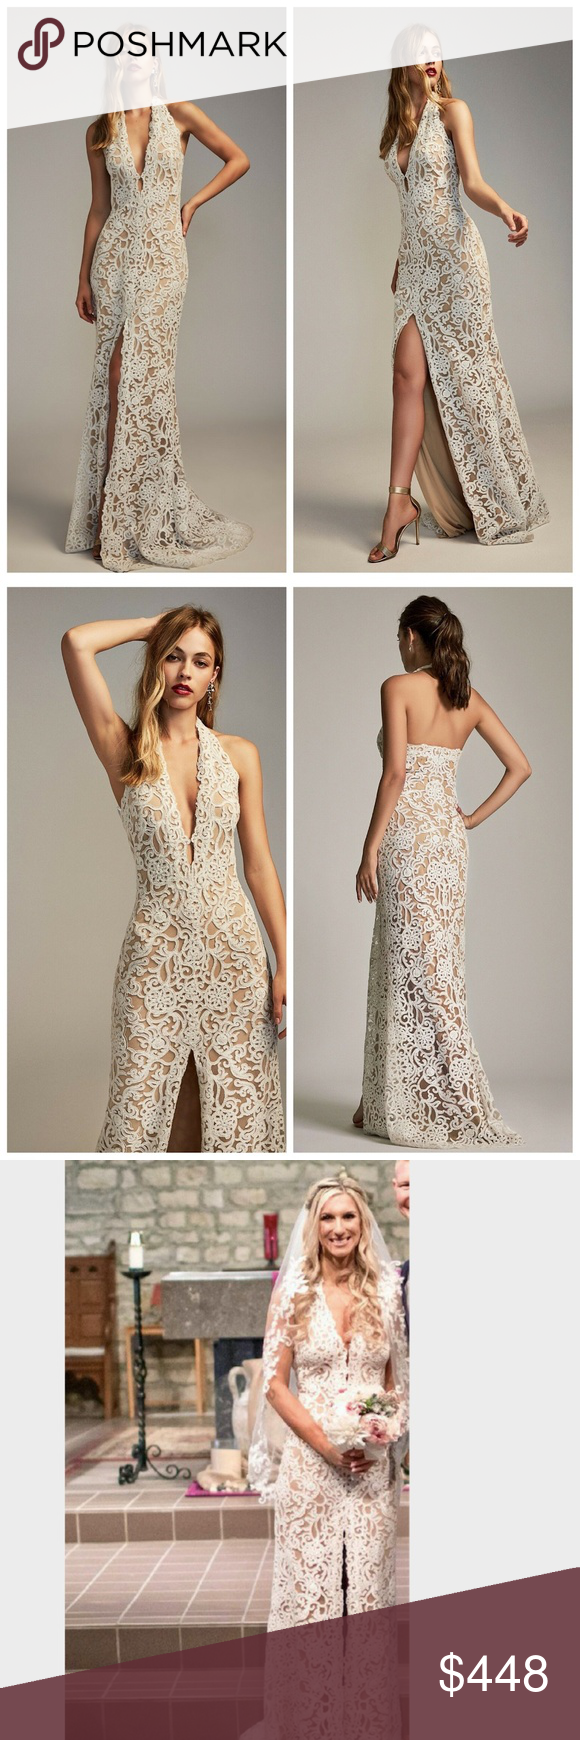 Parker Parker Vicky Dress | Mob dresses, Dresses